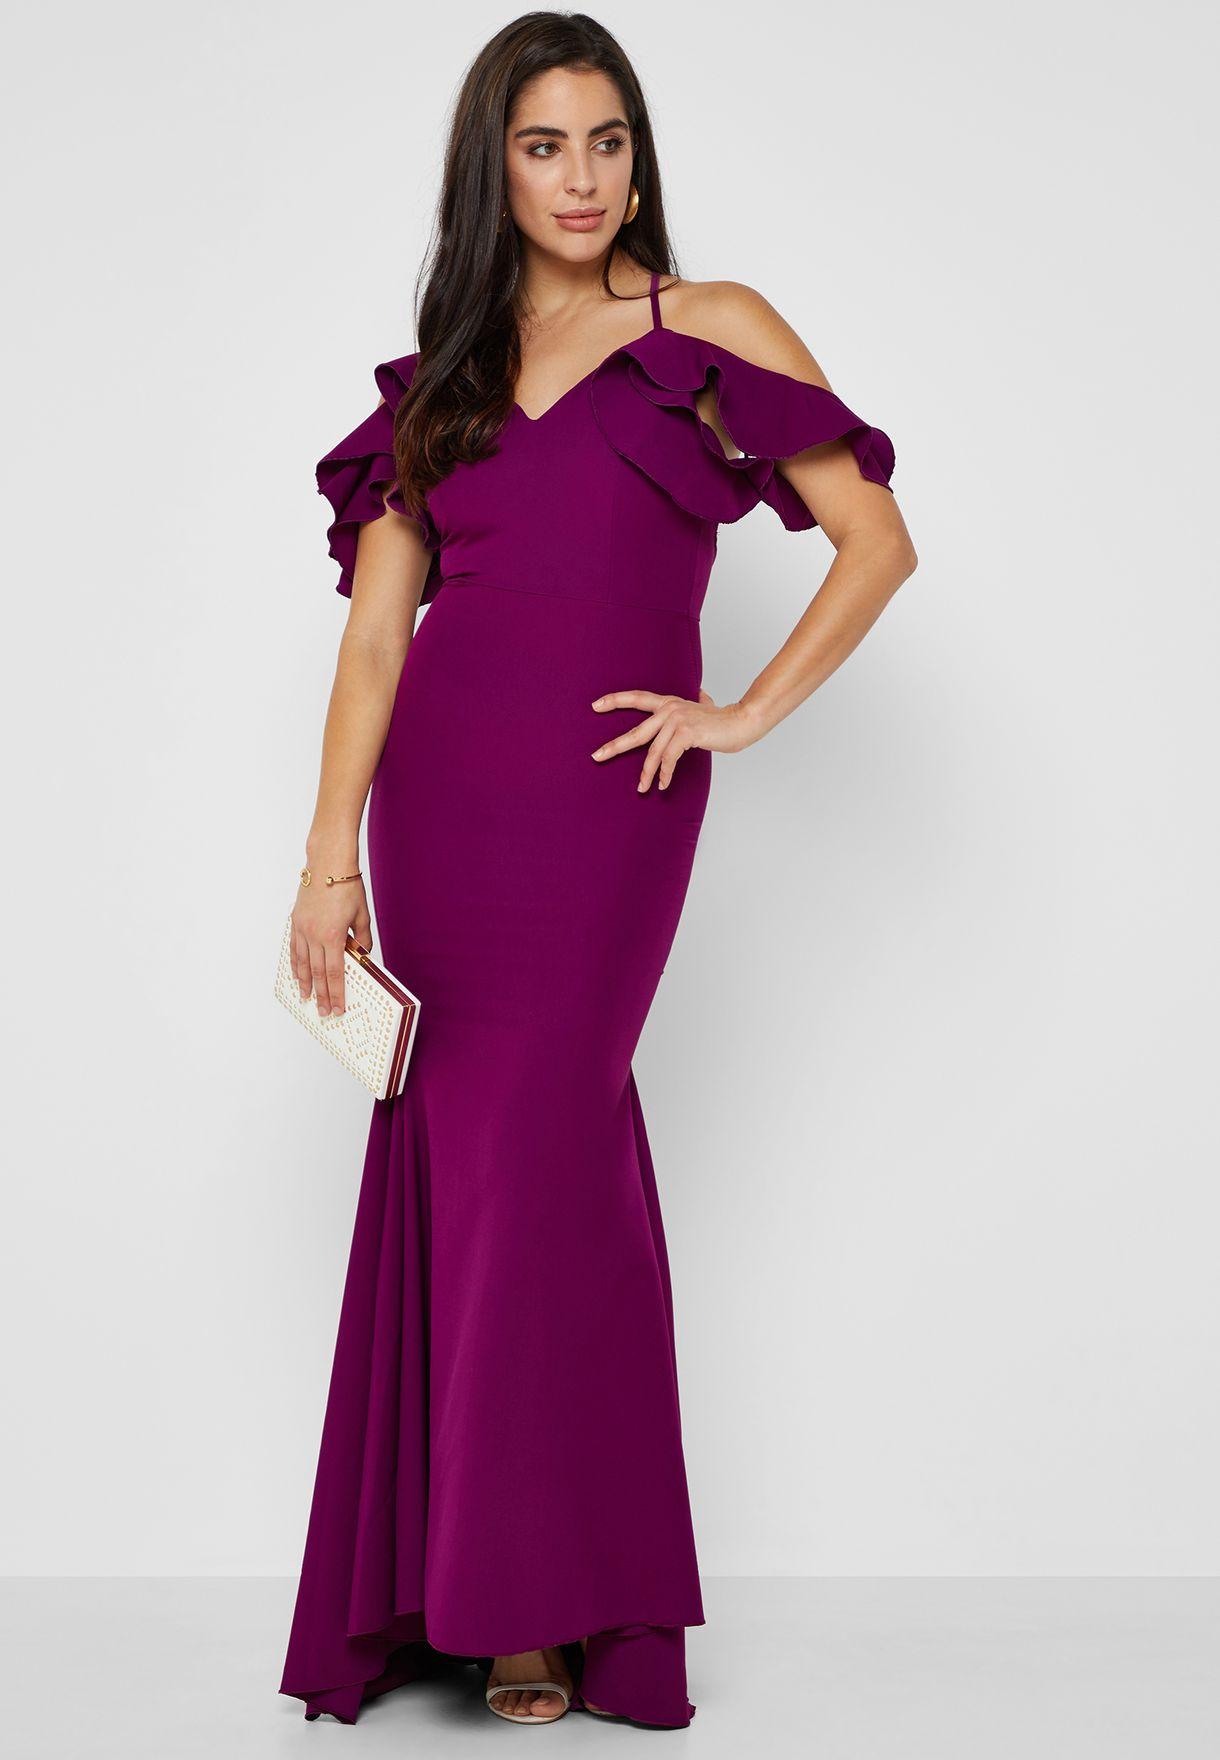 0324c6c8f0da8d Shop Ella purple Ruffle Cold Shoulder Fishtail Maxi Dress 3932 for ...